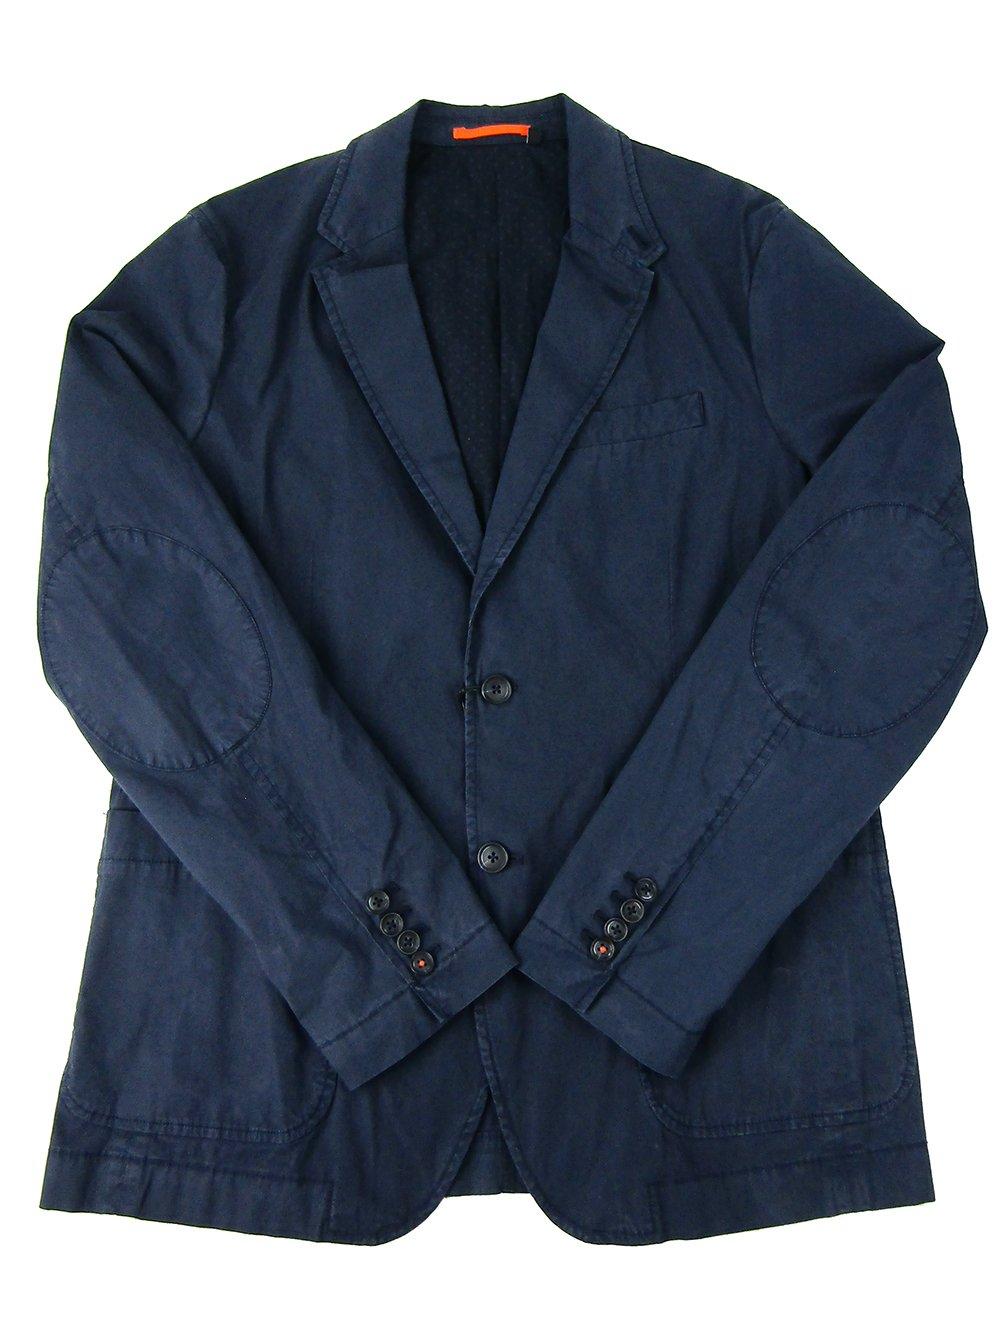 Jack Spade Men's Poplin Travel Blazer (Dark Navy, 40)